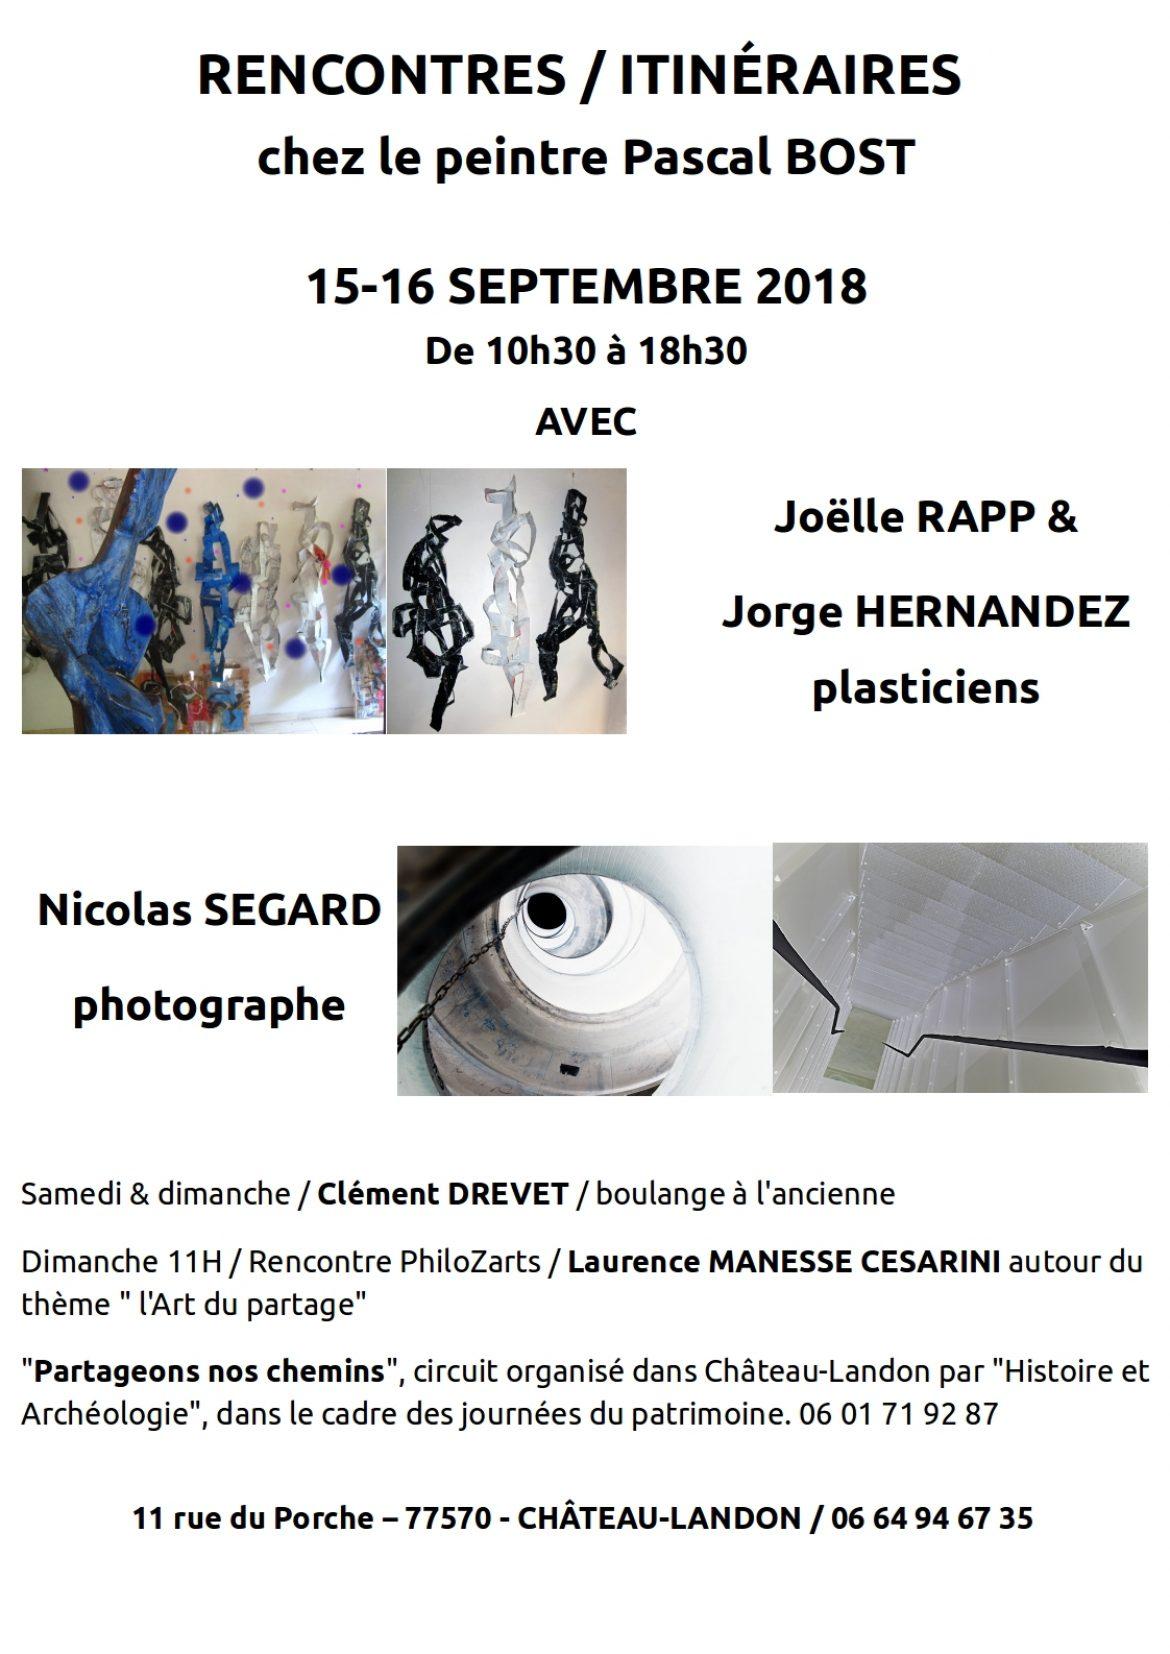 Nicolas Ségard Rencontres Chateau-Landon JEP 2018